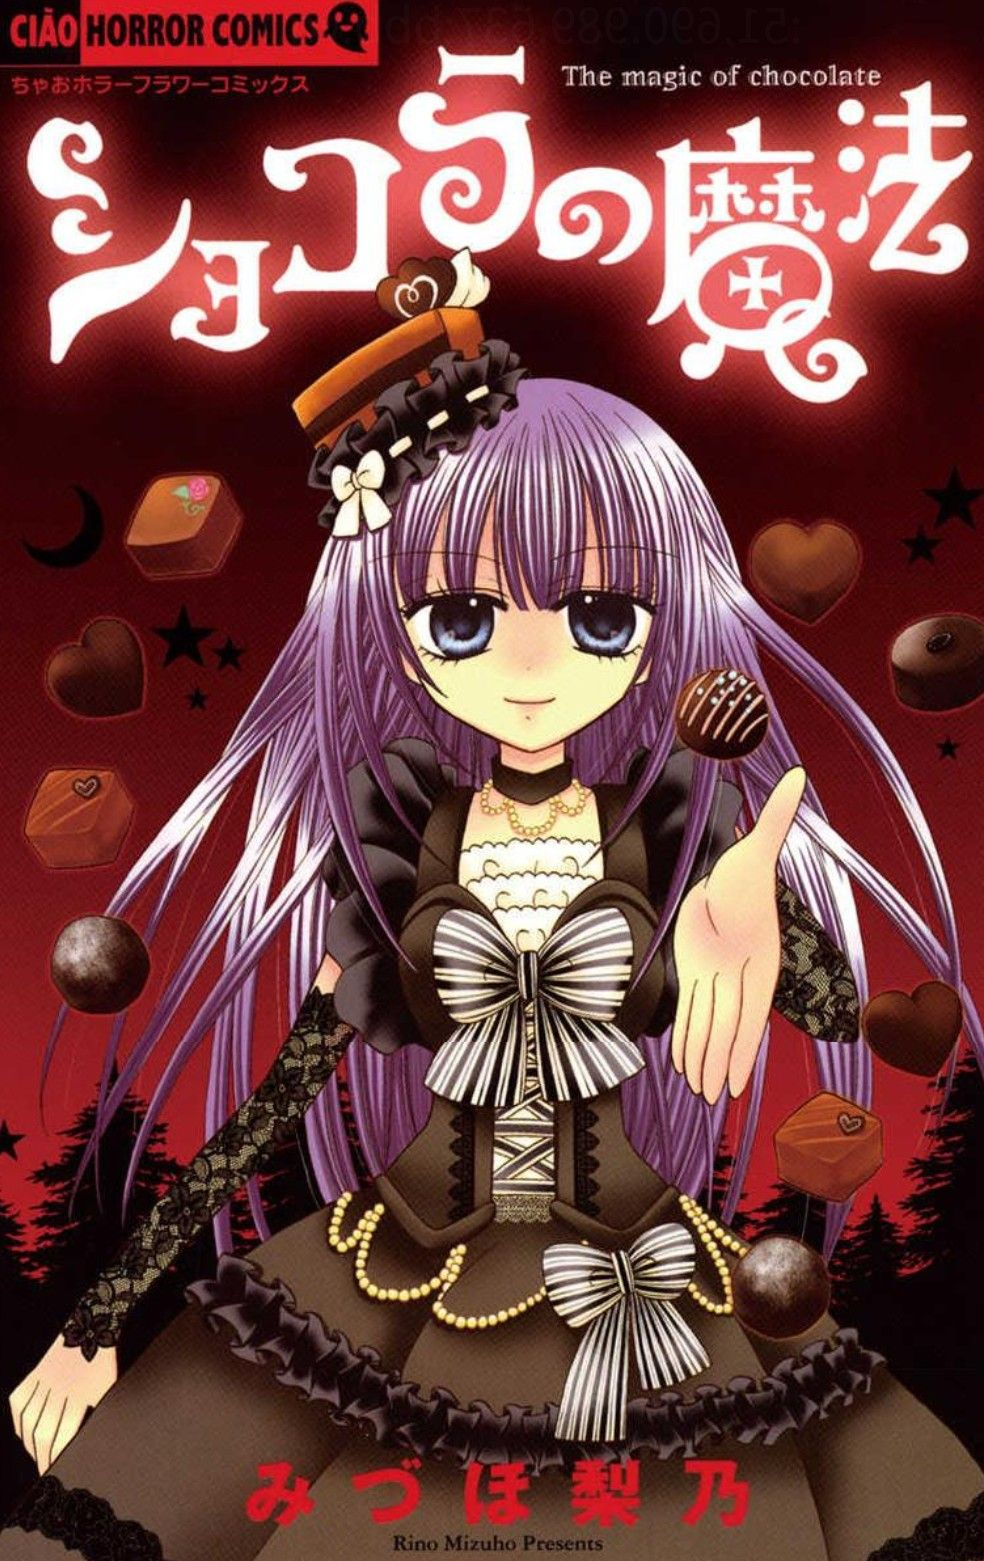 Pin by aauni on magis manis coklat Anime, Horror comics